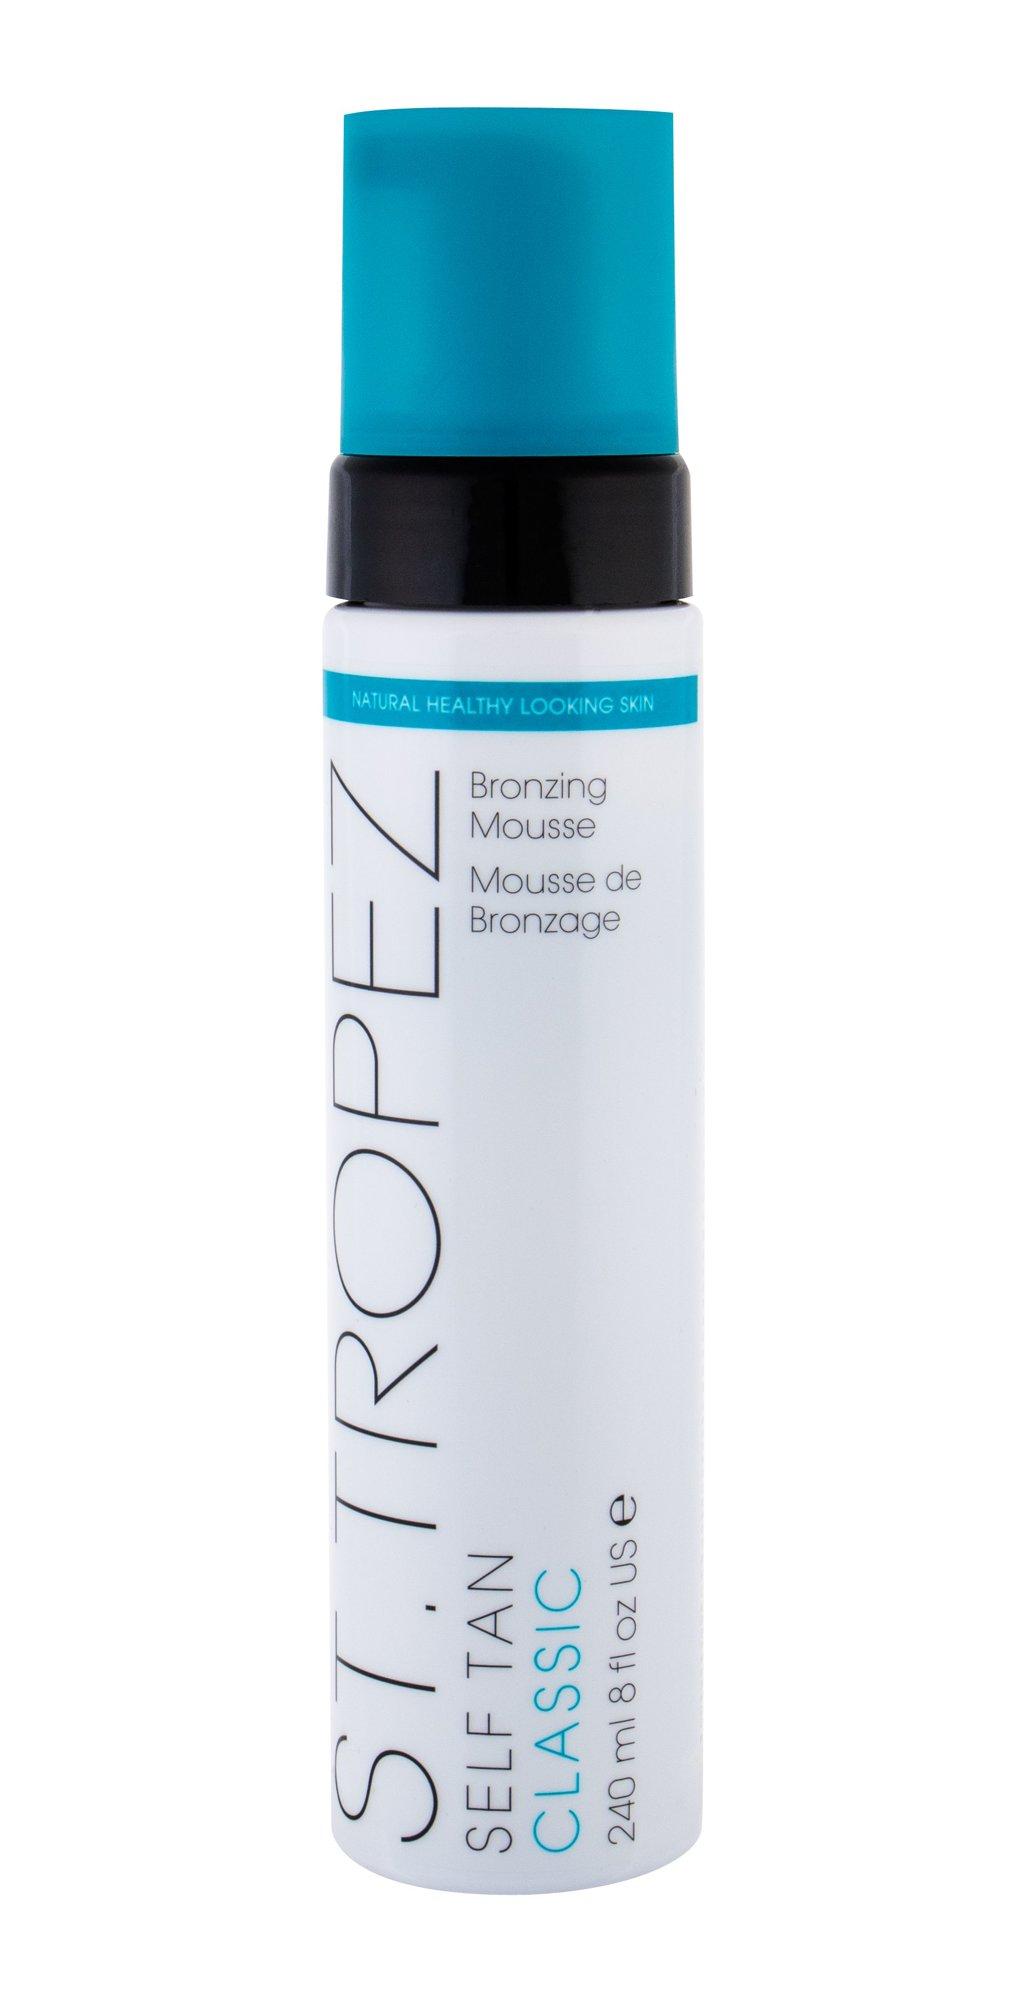 St.Tropez Self Tan Self Tanning Product 240ml  Classic